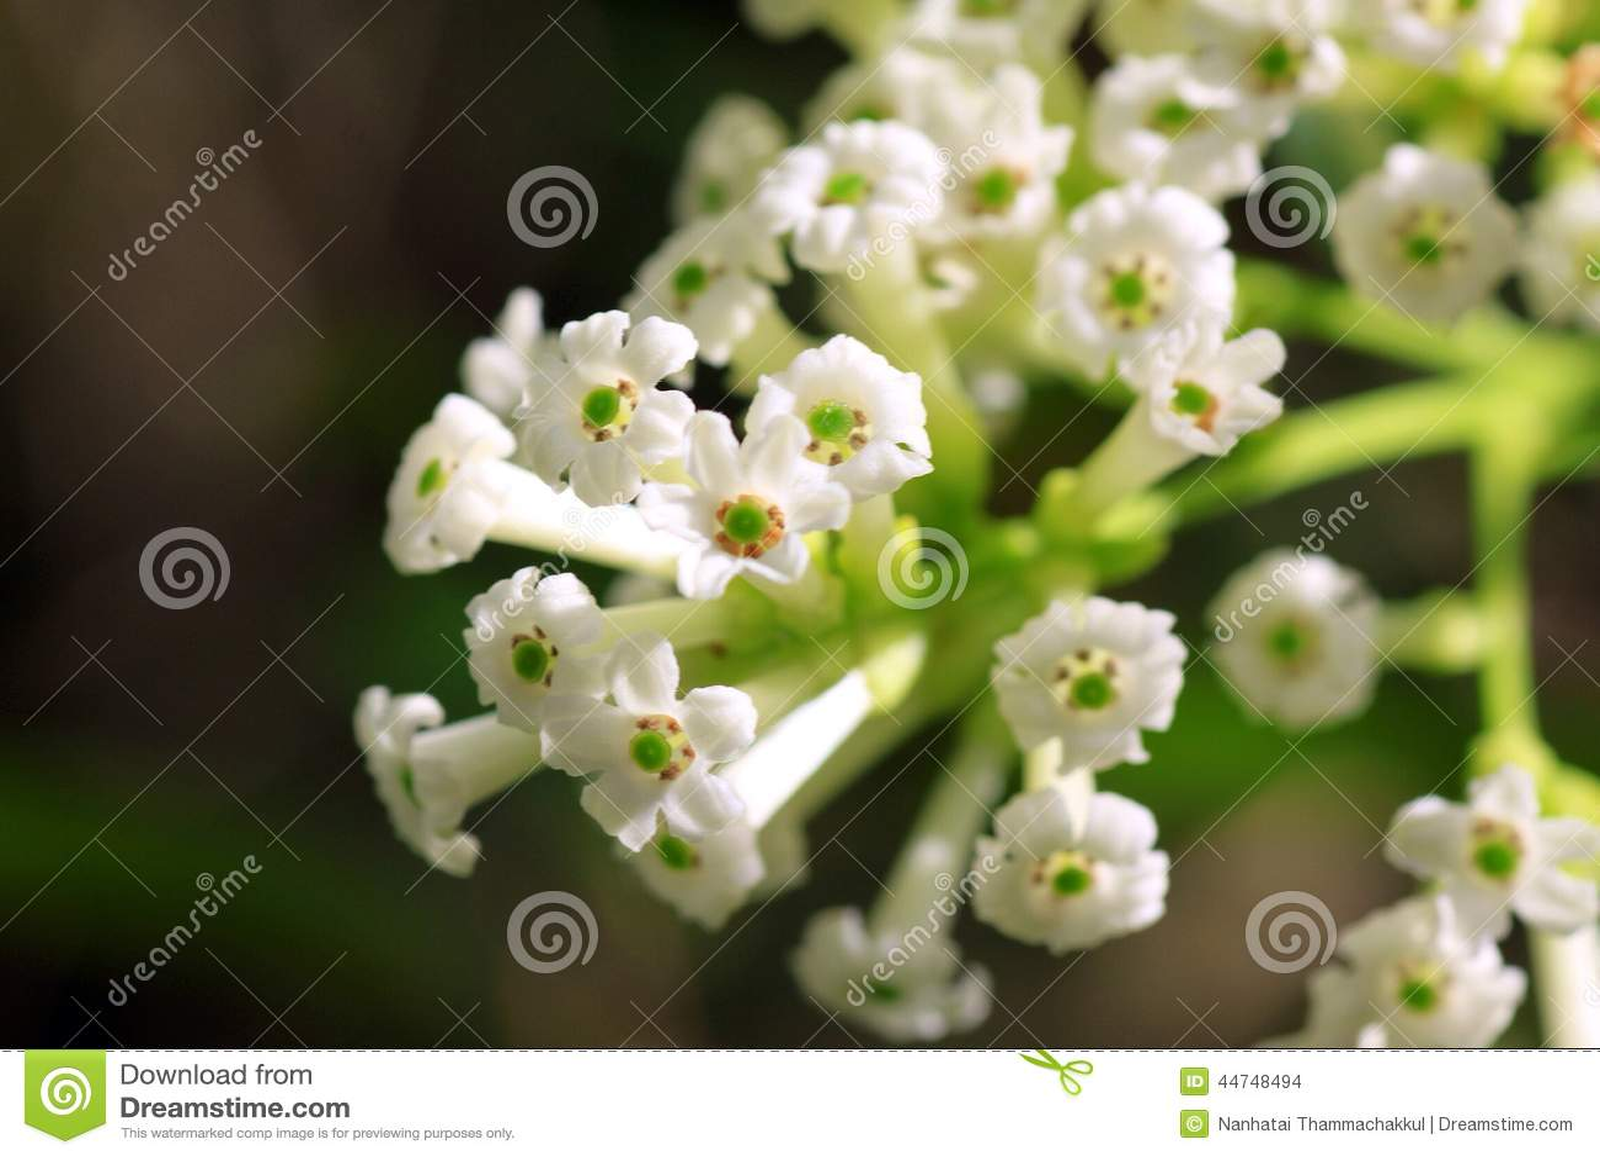 Bouquet of white flower stock photo image of nature 44748494 small bouquet of white flower name day cestrum mightylinksfo